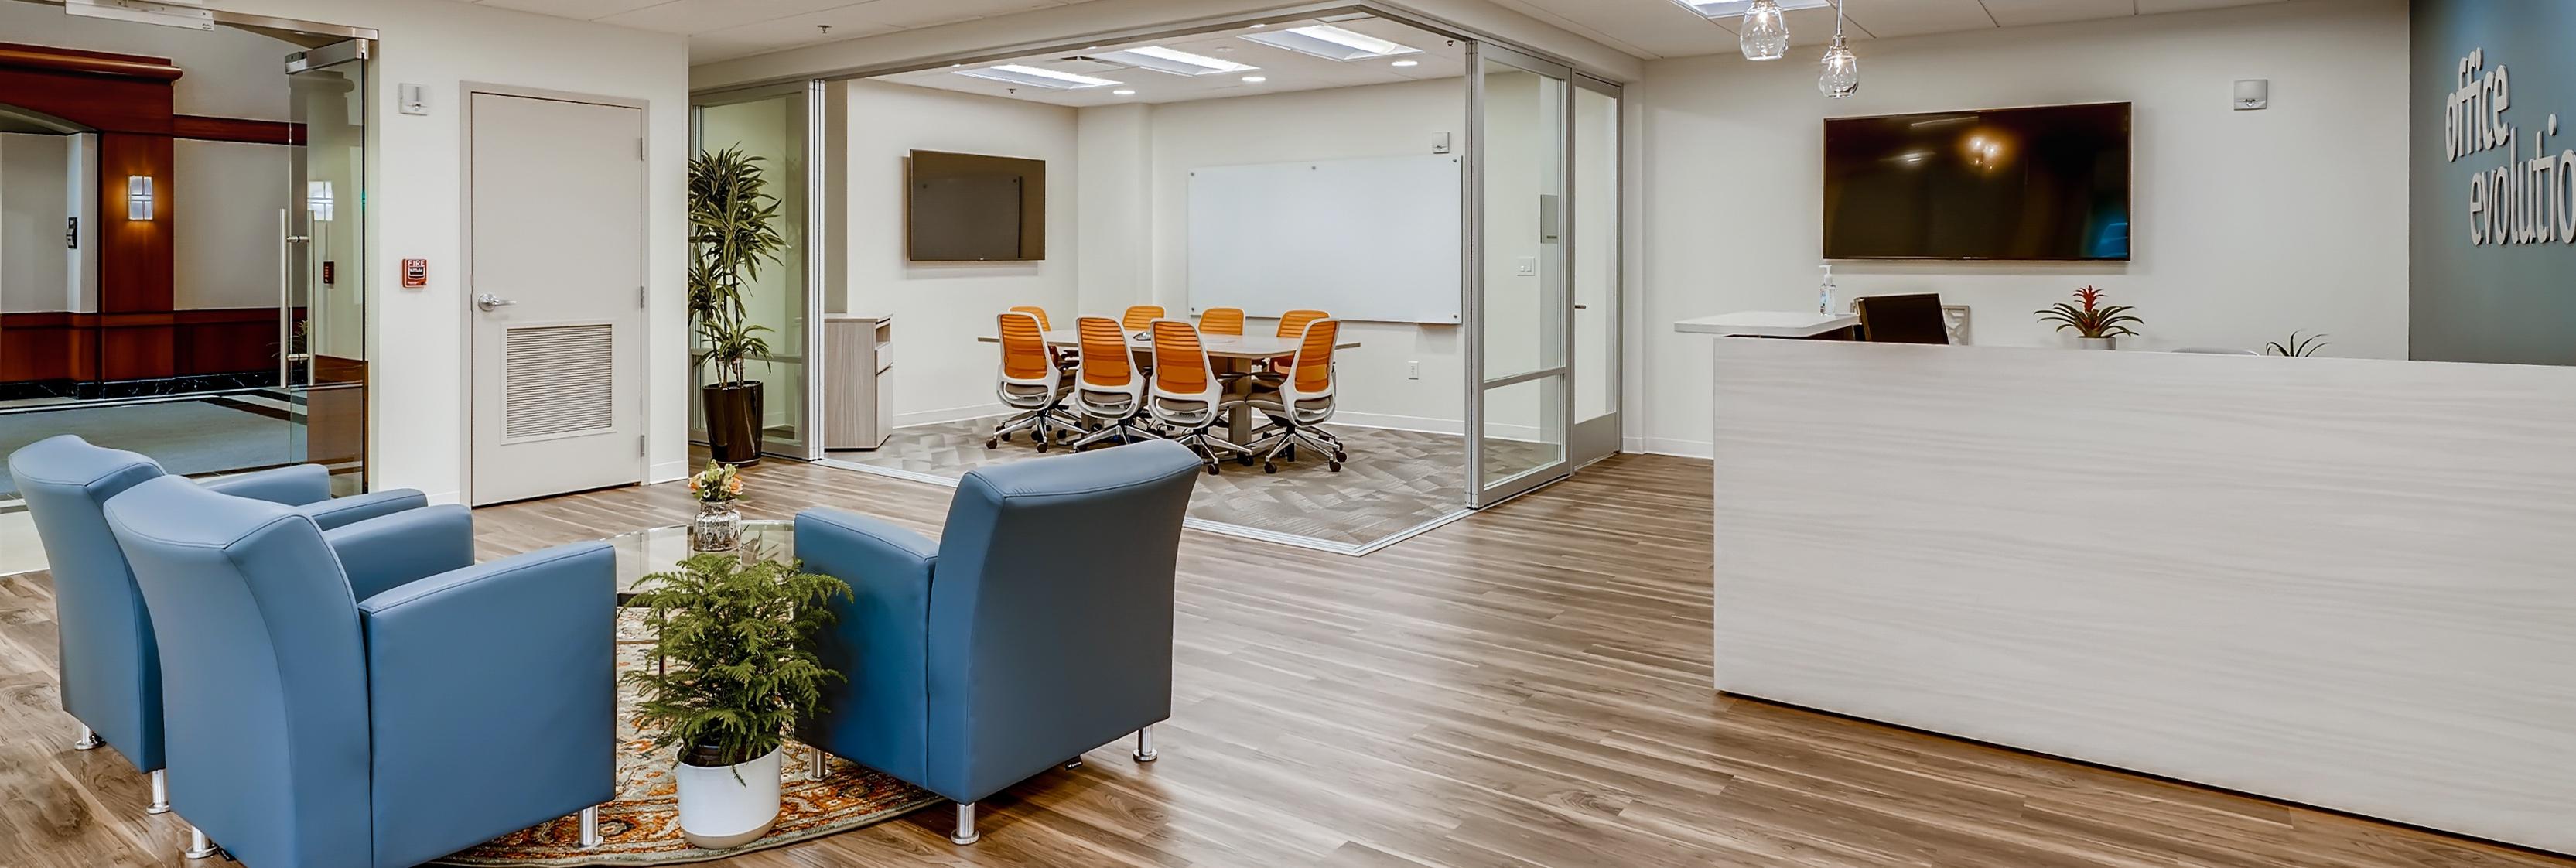 Office Evolution Johns Creek reviews | Shared Office Spaces at 6470 E Johns Crossing - Johns Creek GA